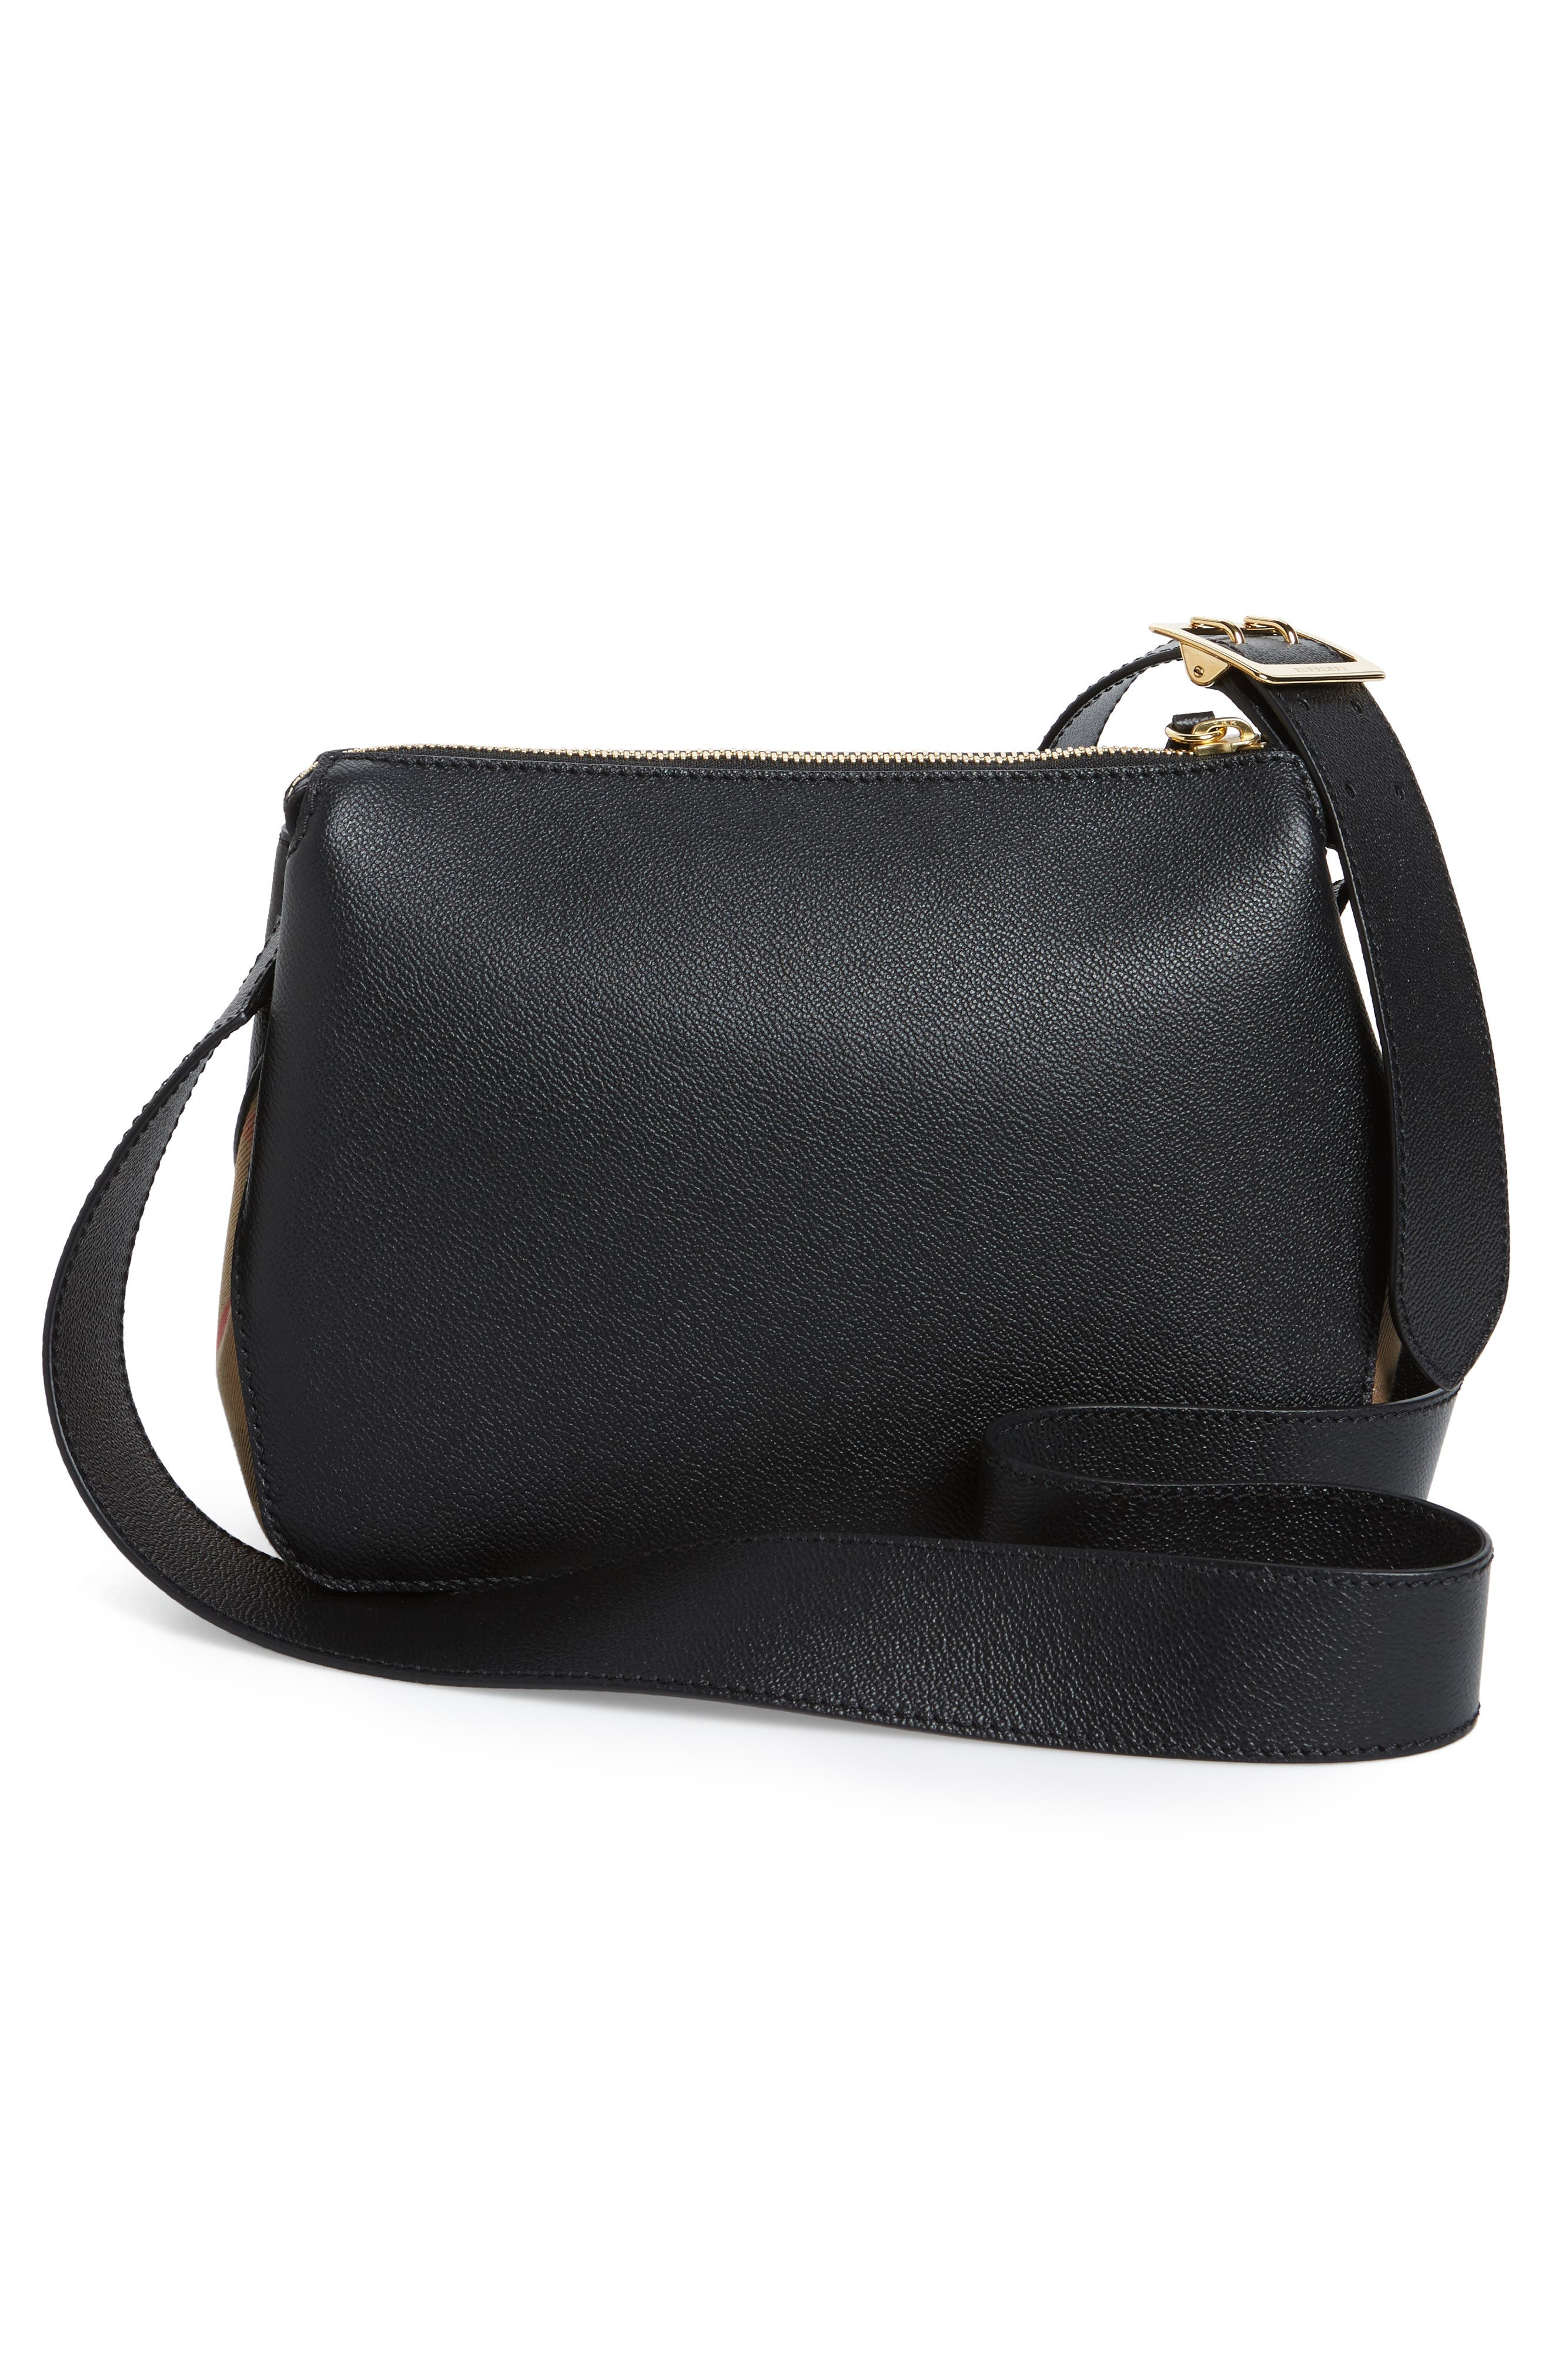 Alternate Image 3  - Burberry Helmsley House Check Leather Crossbody Bag